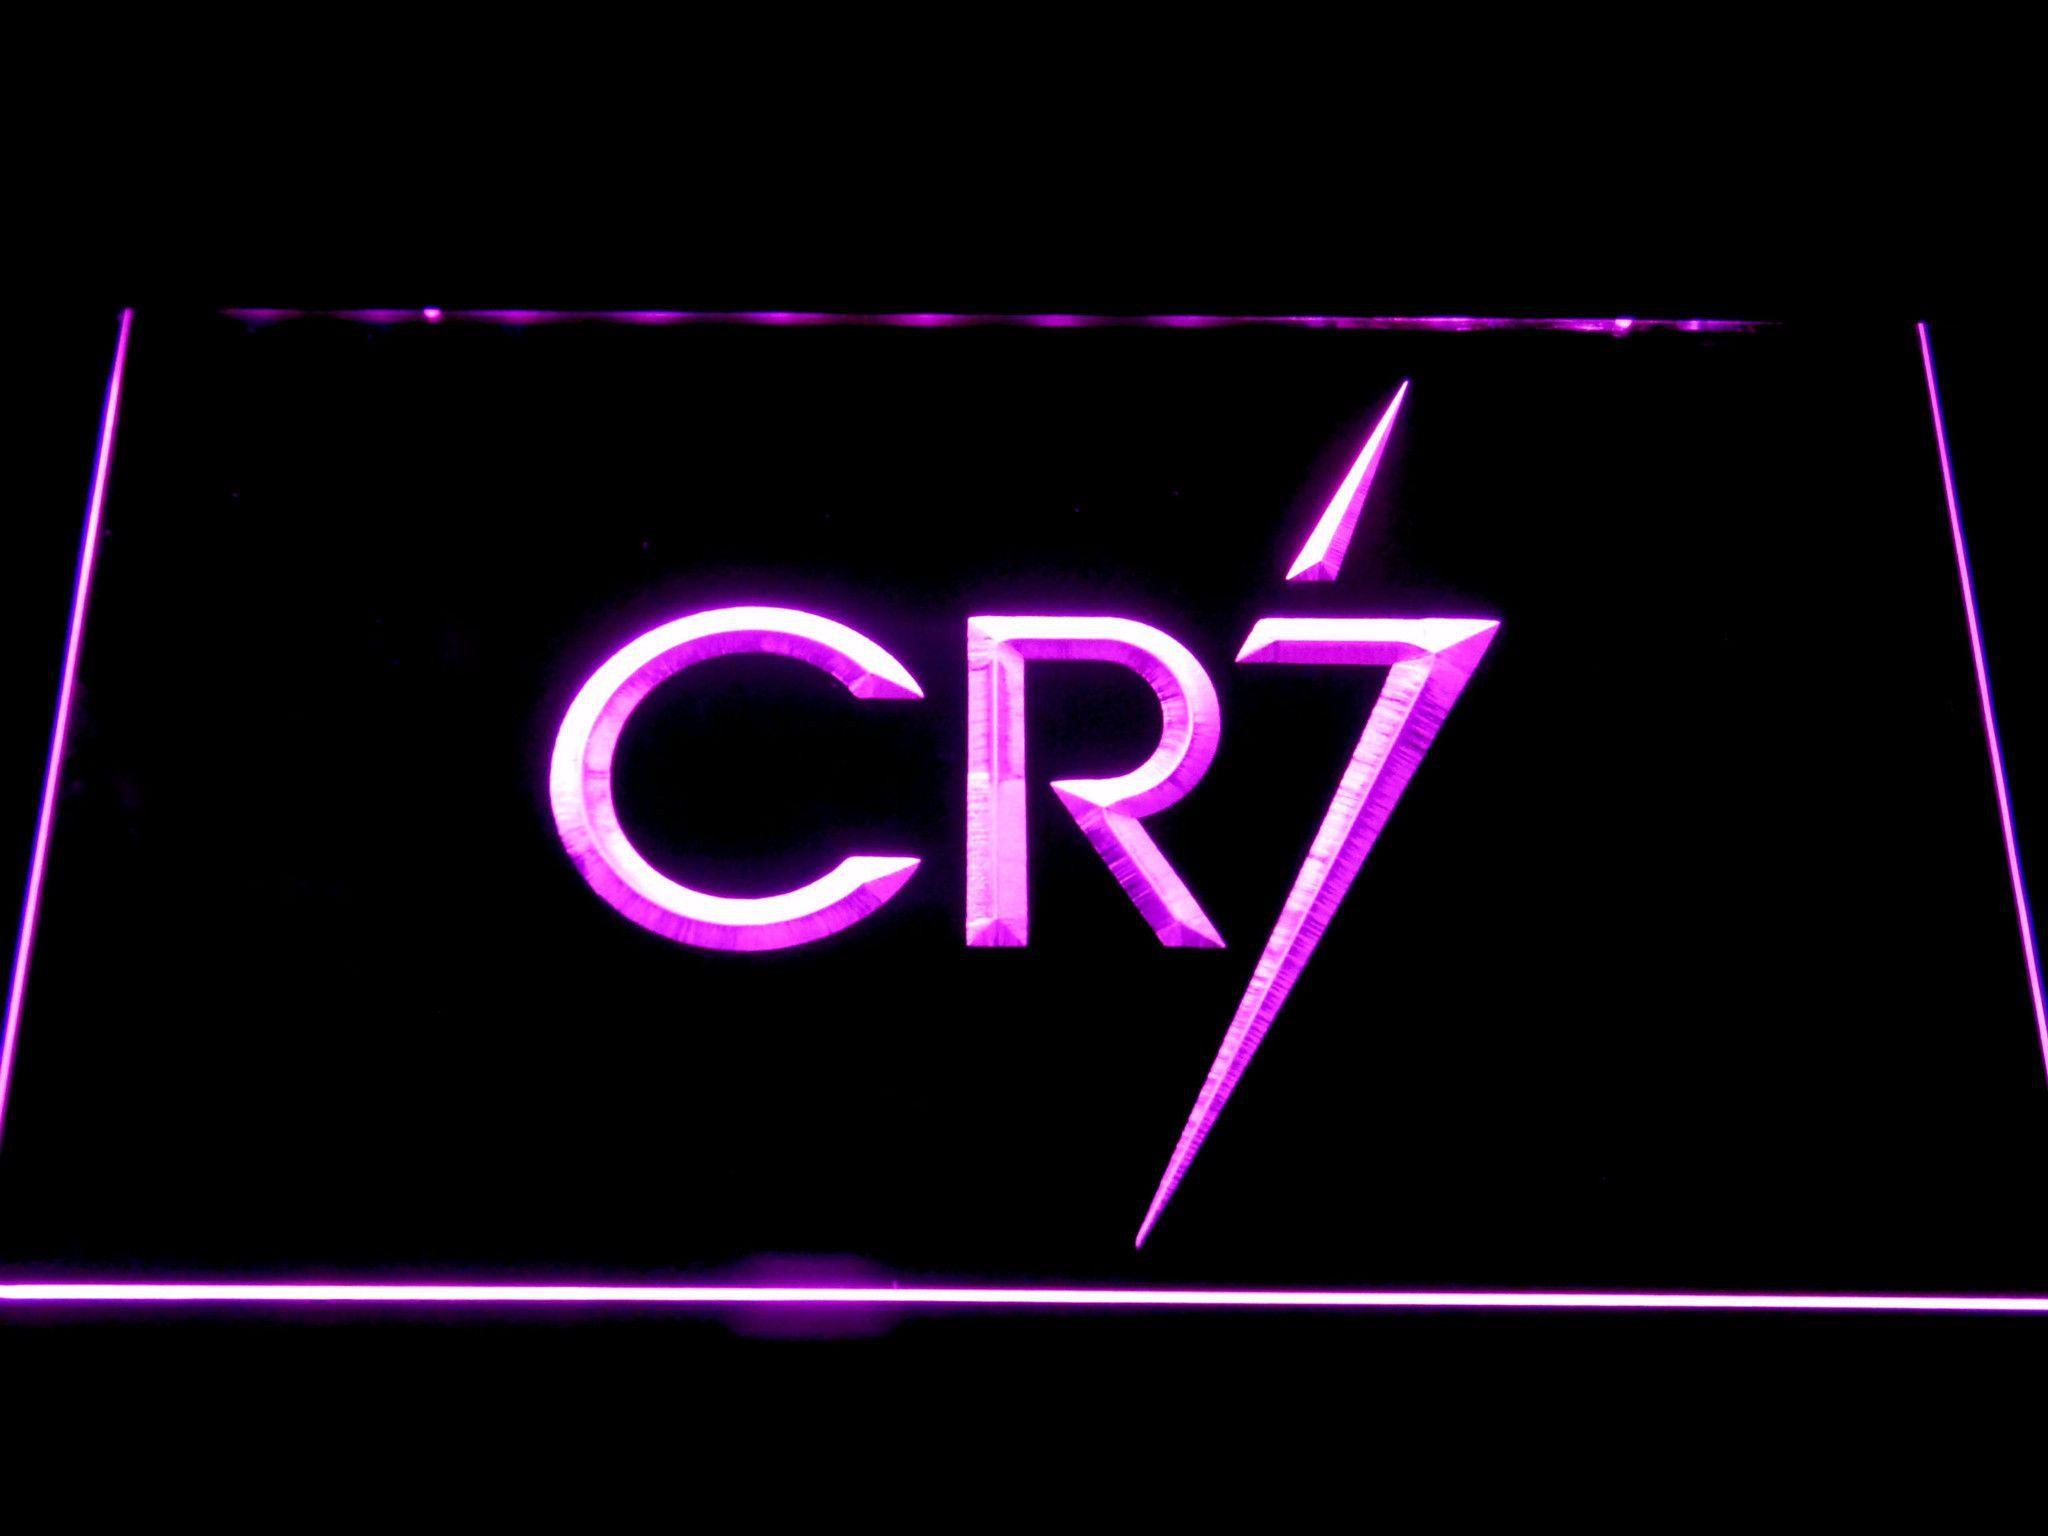 Real Madrid CF Cristiano Ronaldo CR7 Logo LED Neon Sign in.